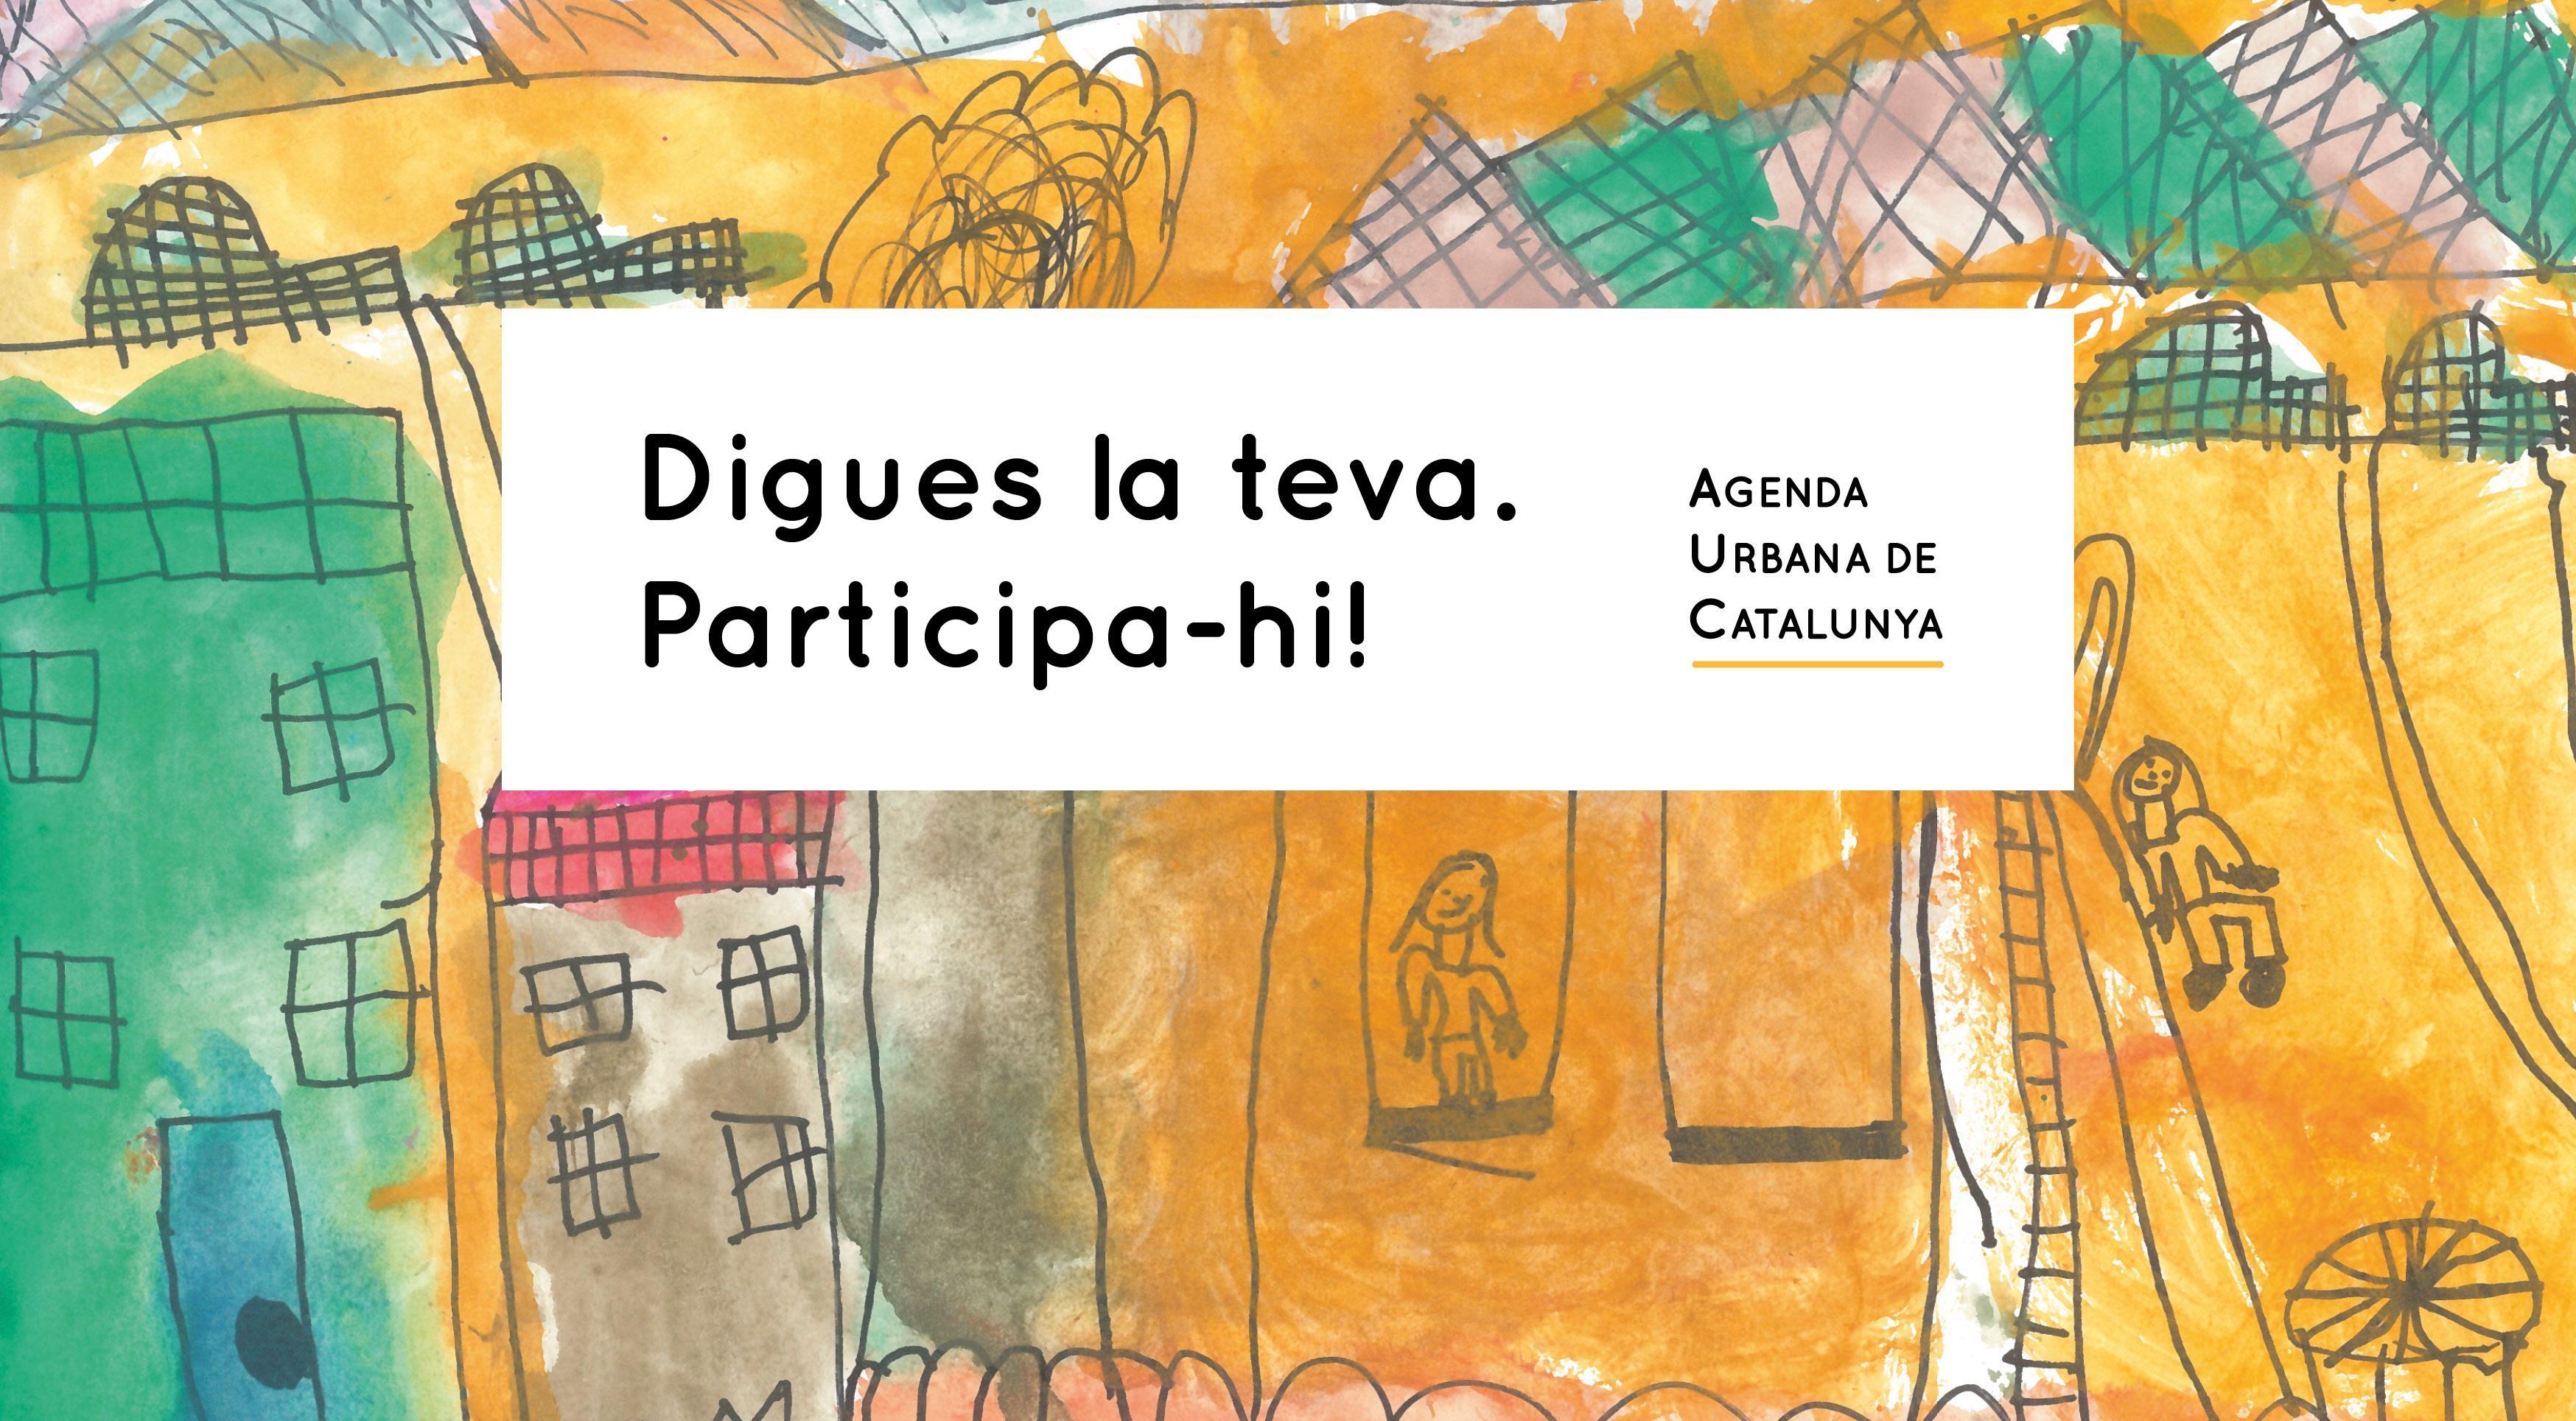 Agenda Urbana de Catalunya